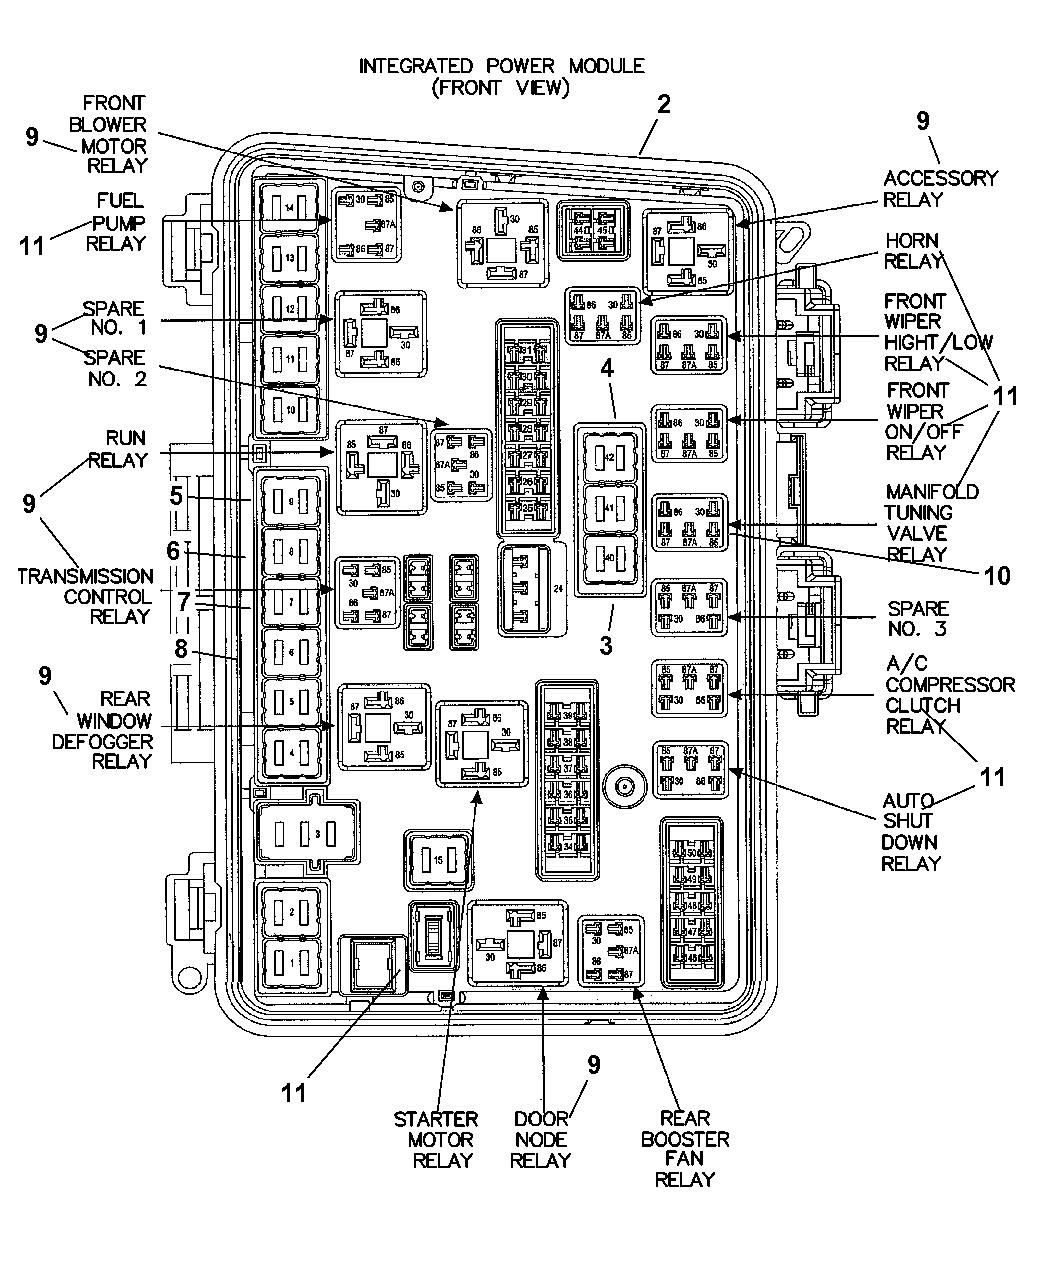 2008 chrysler pt cruiser fuse box diagram 2005 pacifica fuse box diagram wiring diagram e7  2005 pacifica fuse box diagram wiring